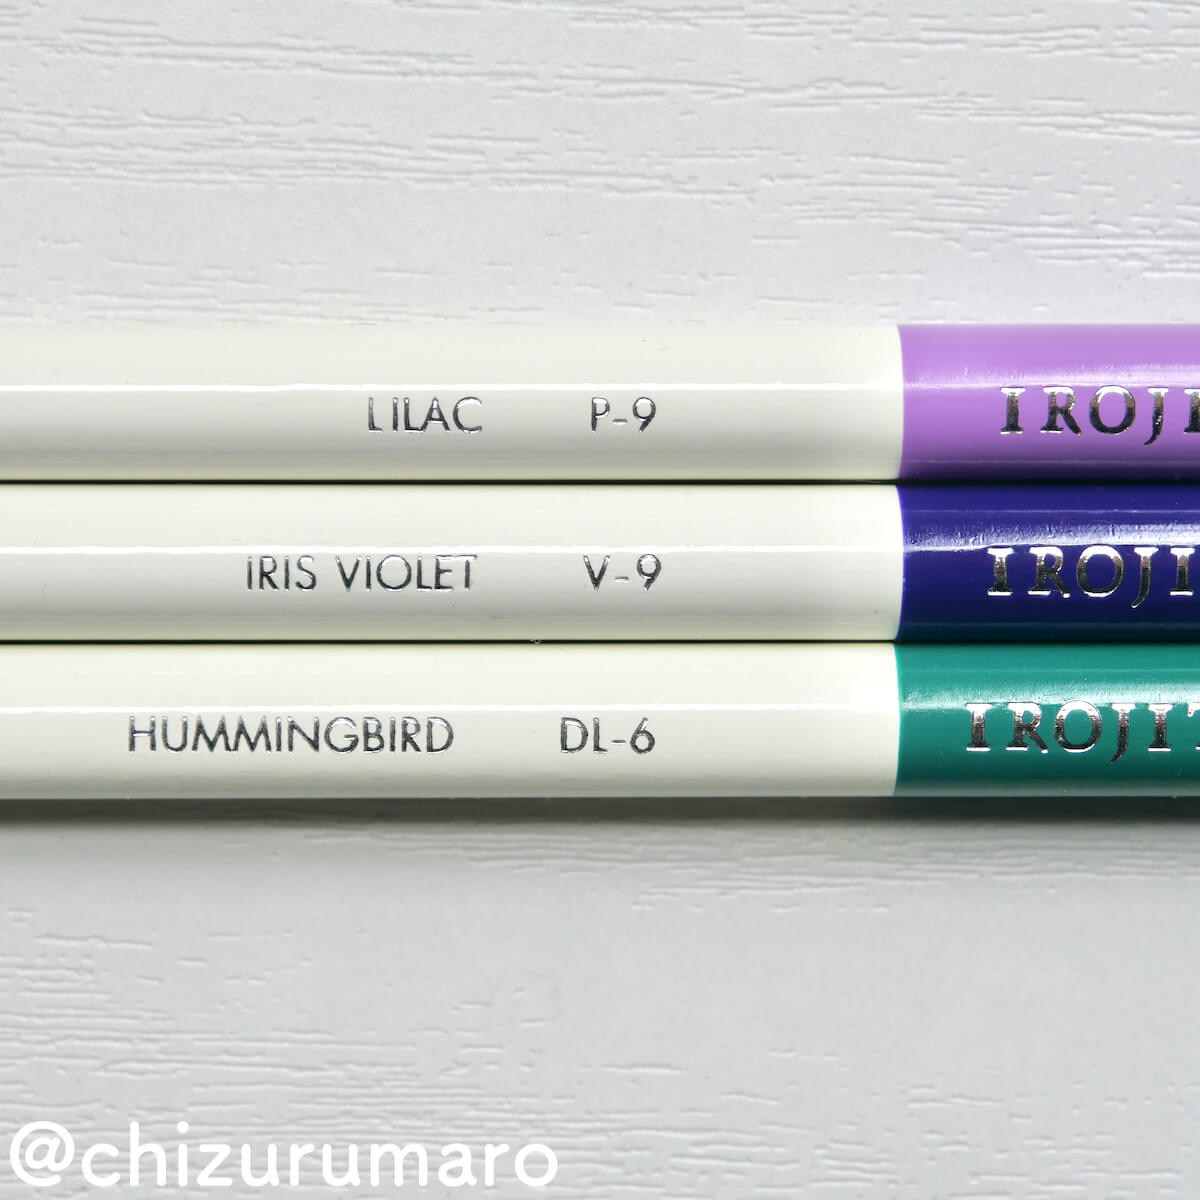 f:id:chizurumaro:20210504150326j:plain